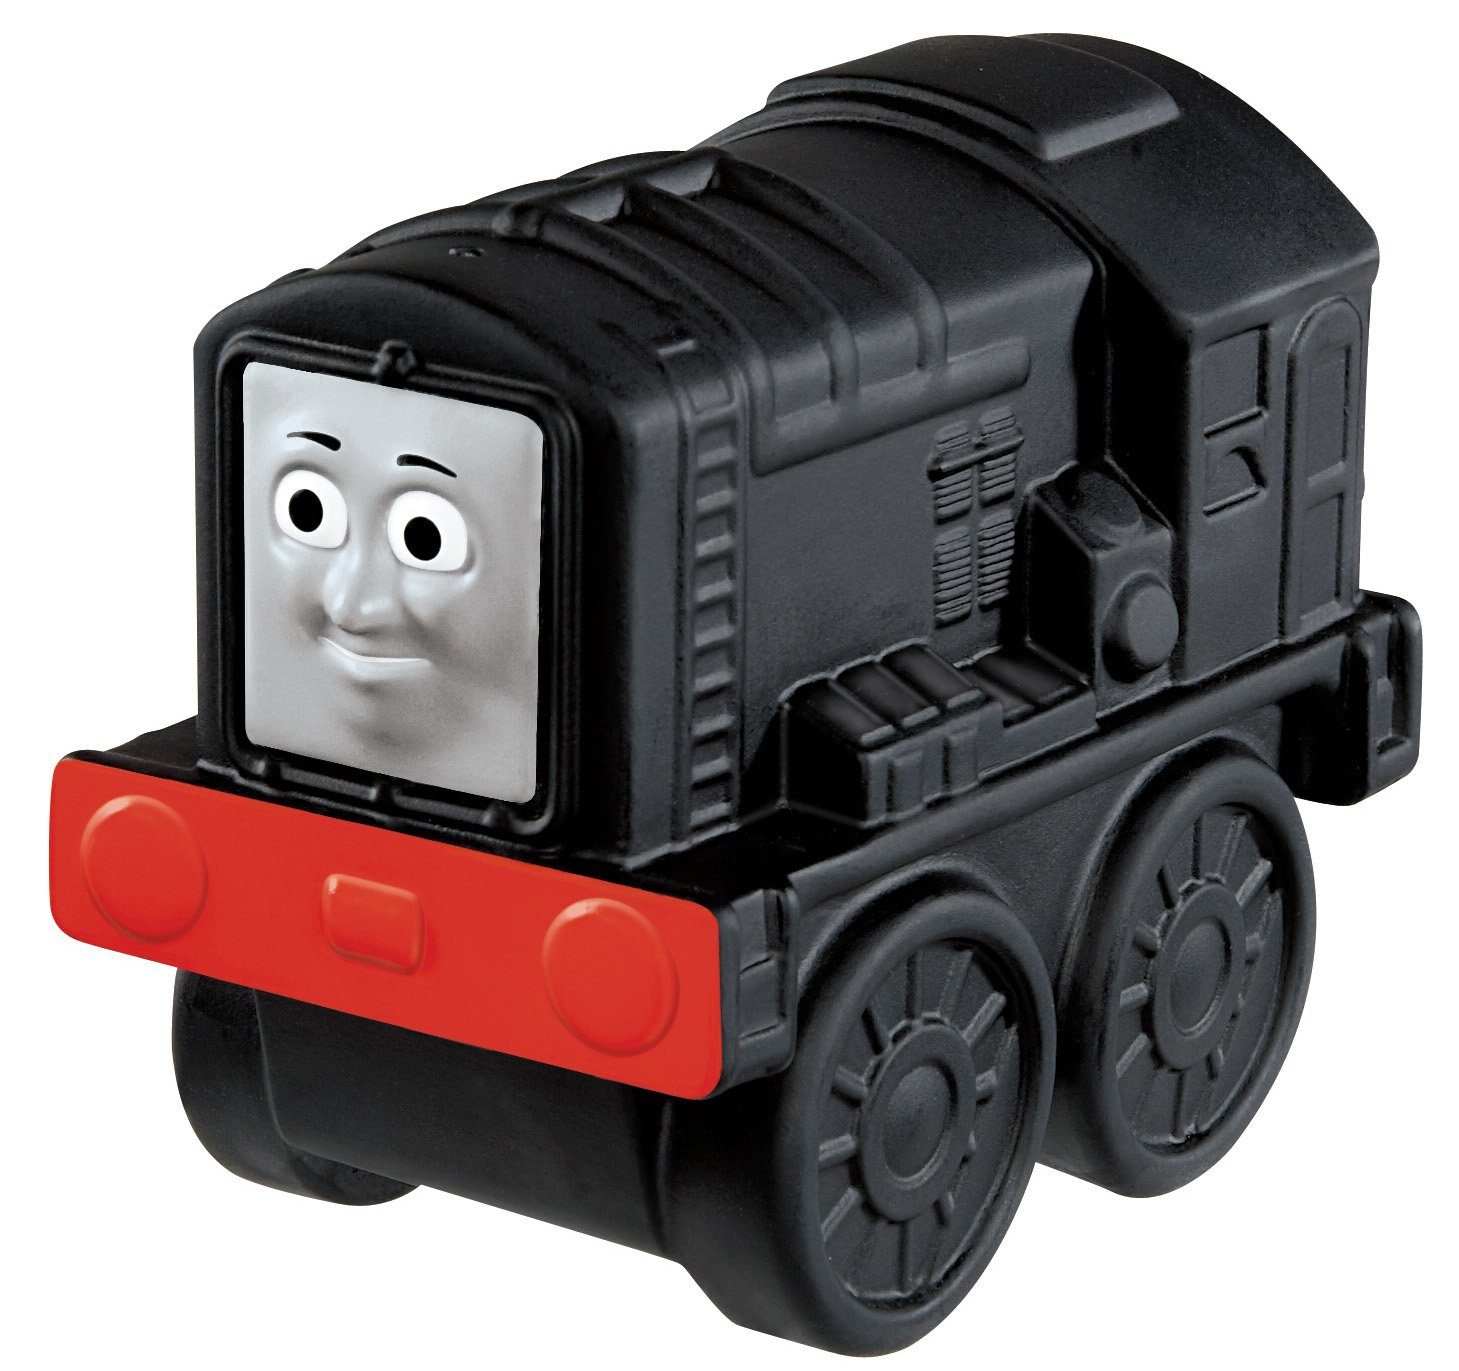 Amazon.com: Fisher-Price My First Thomas The Train Diesel Bath ...